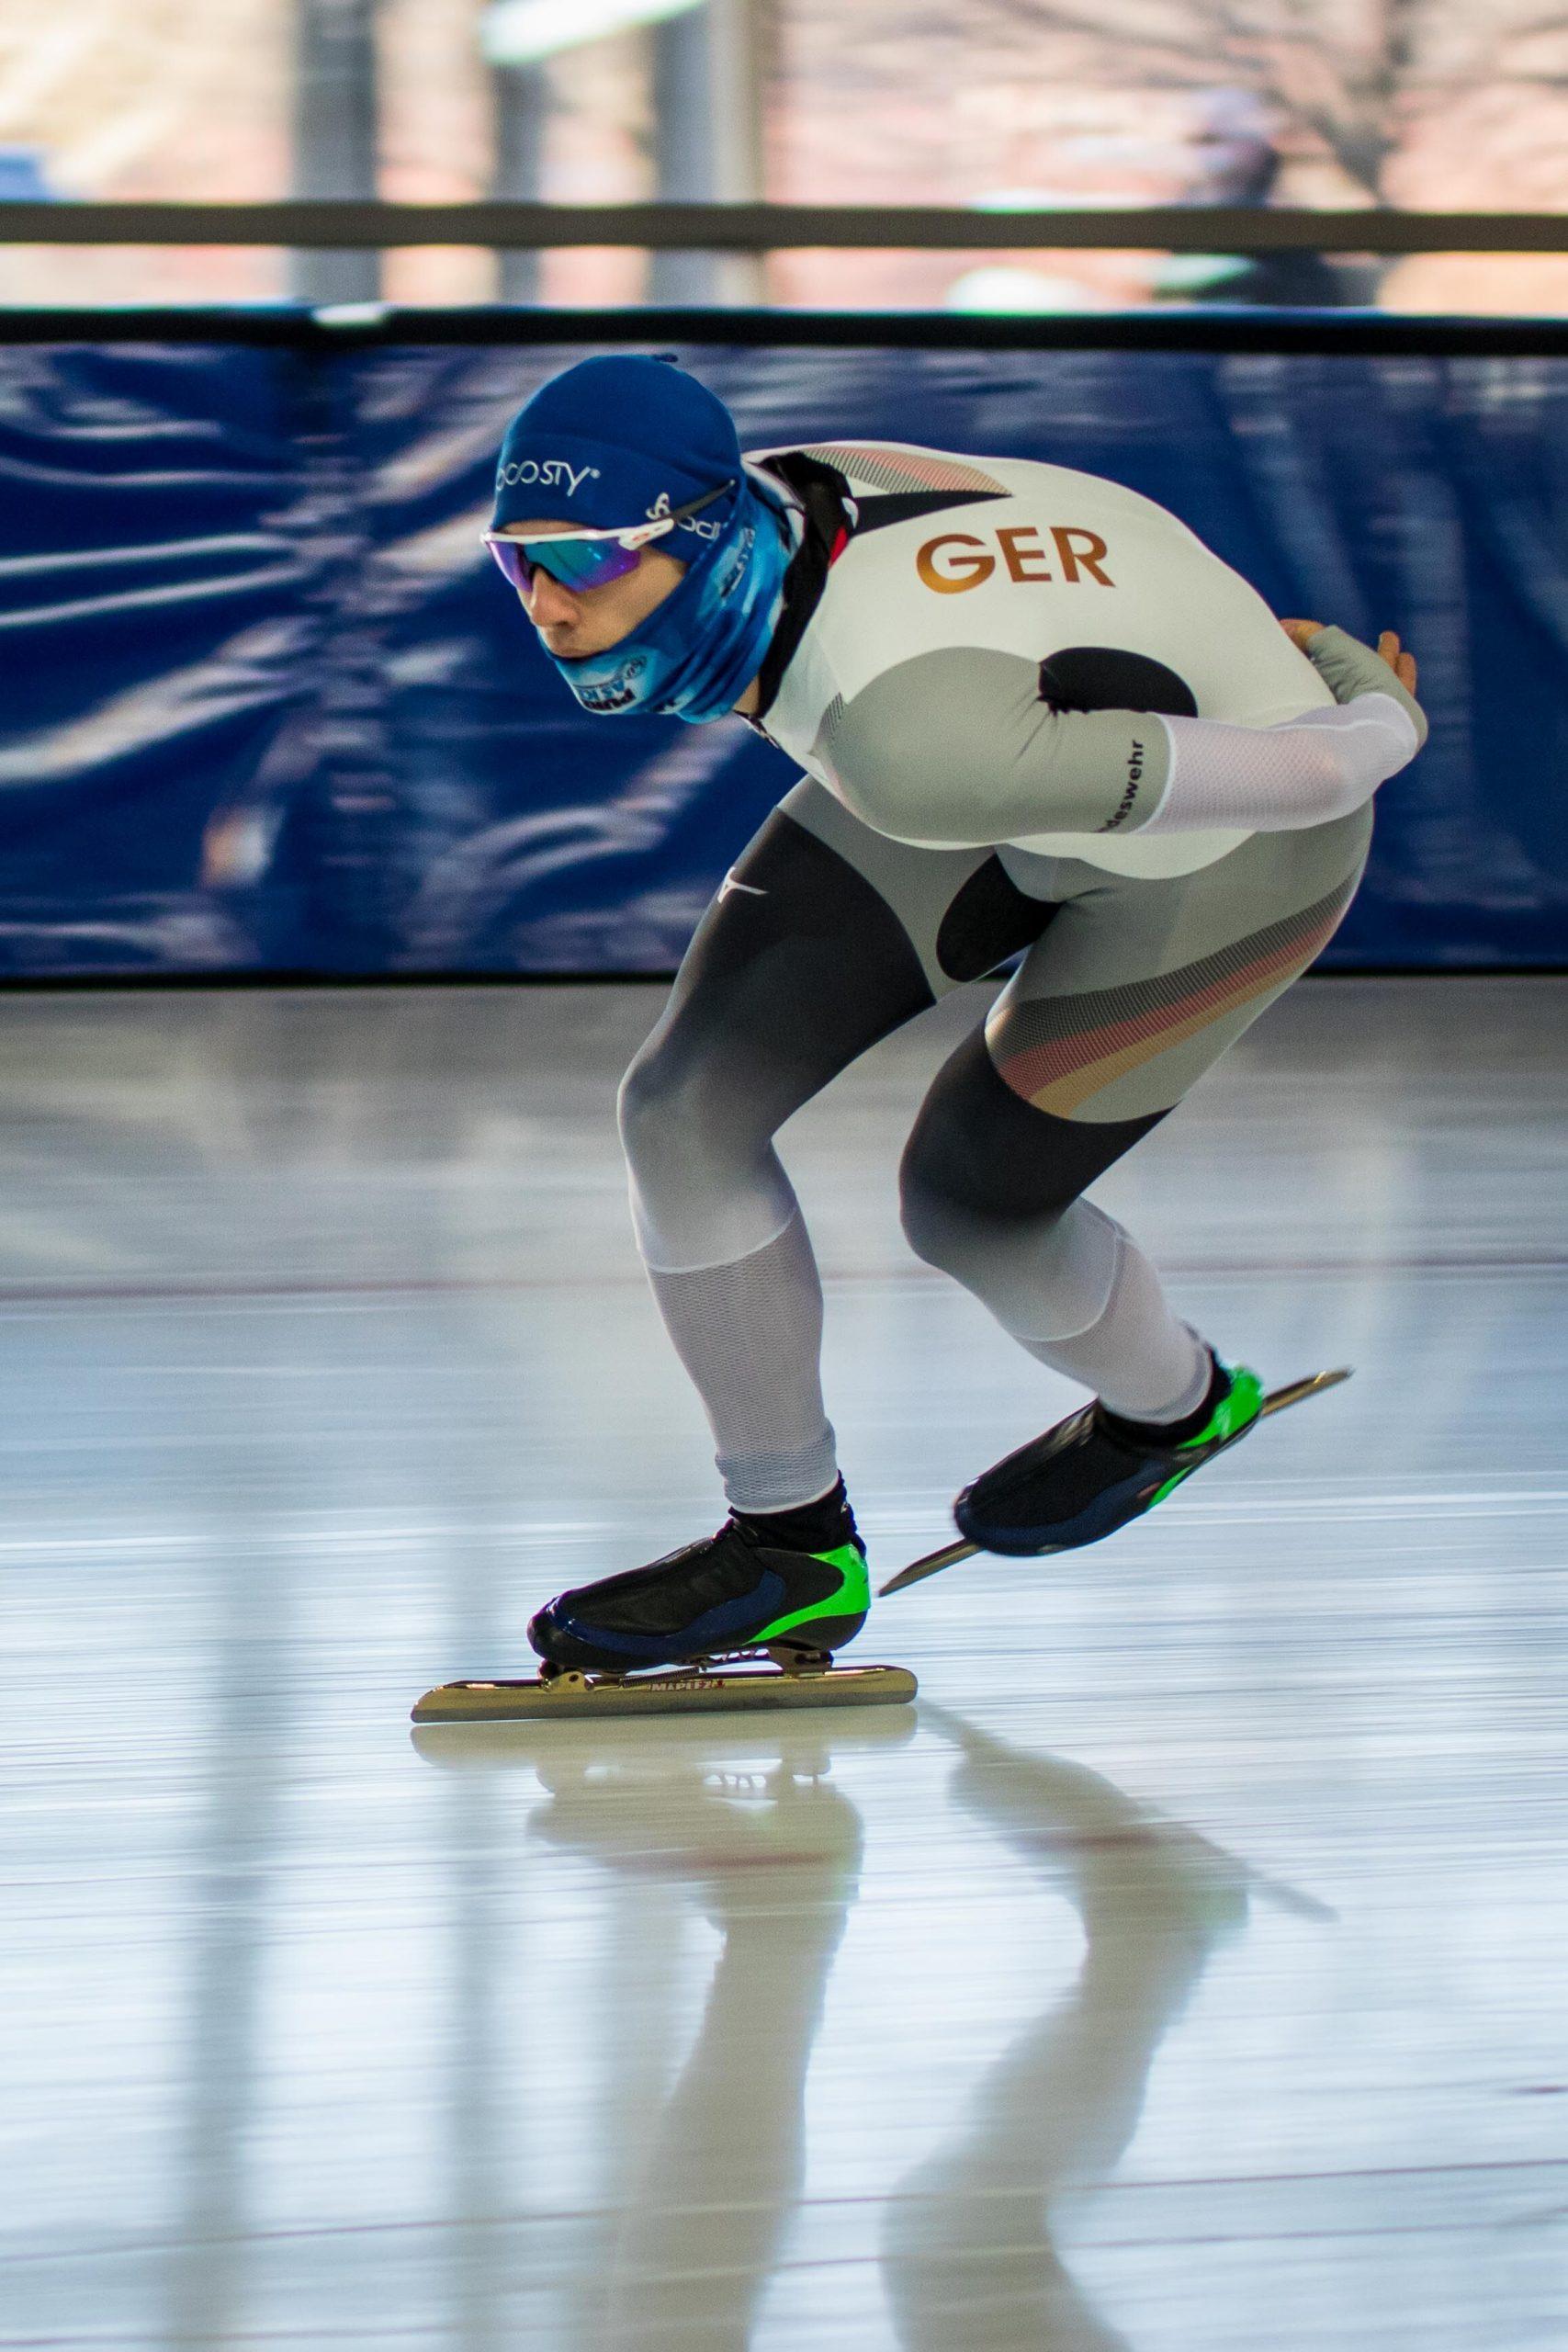 Hendrik Dombek startet bei Sprint-WM in Hamar (NOR)